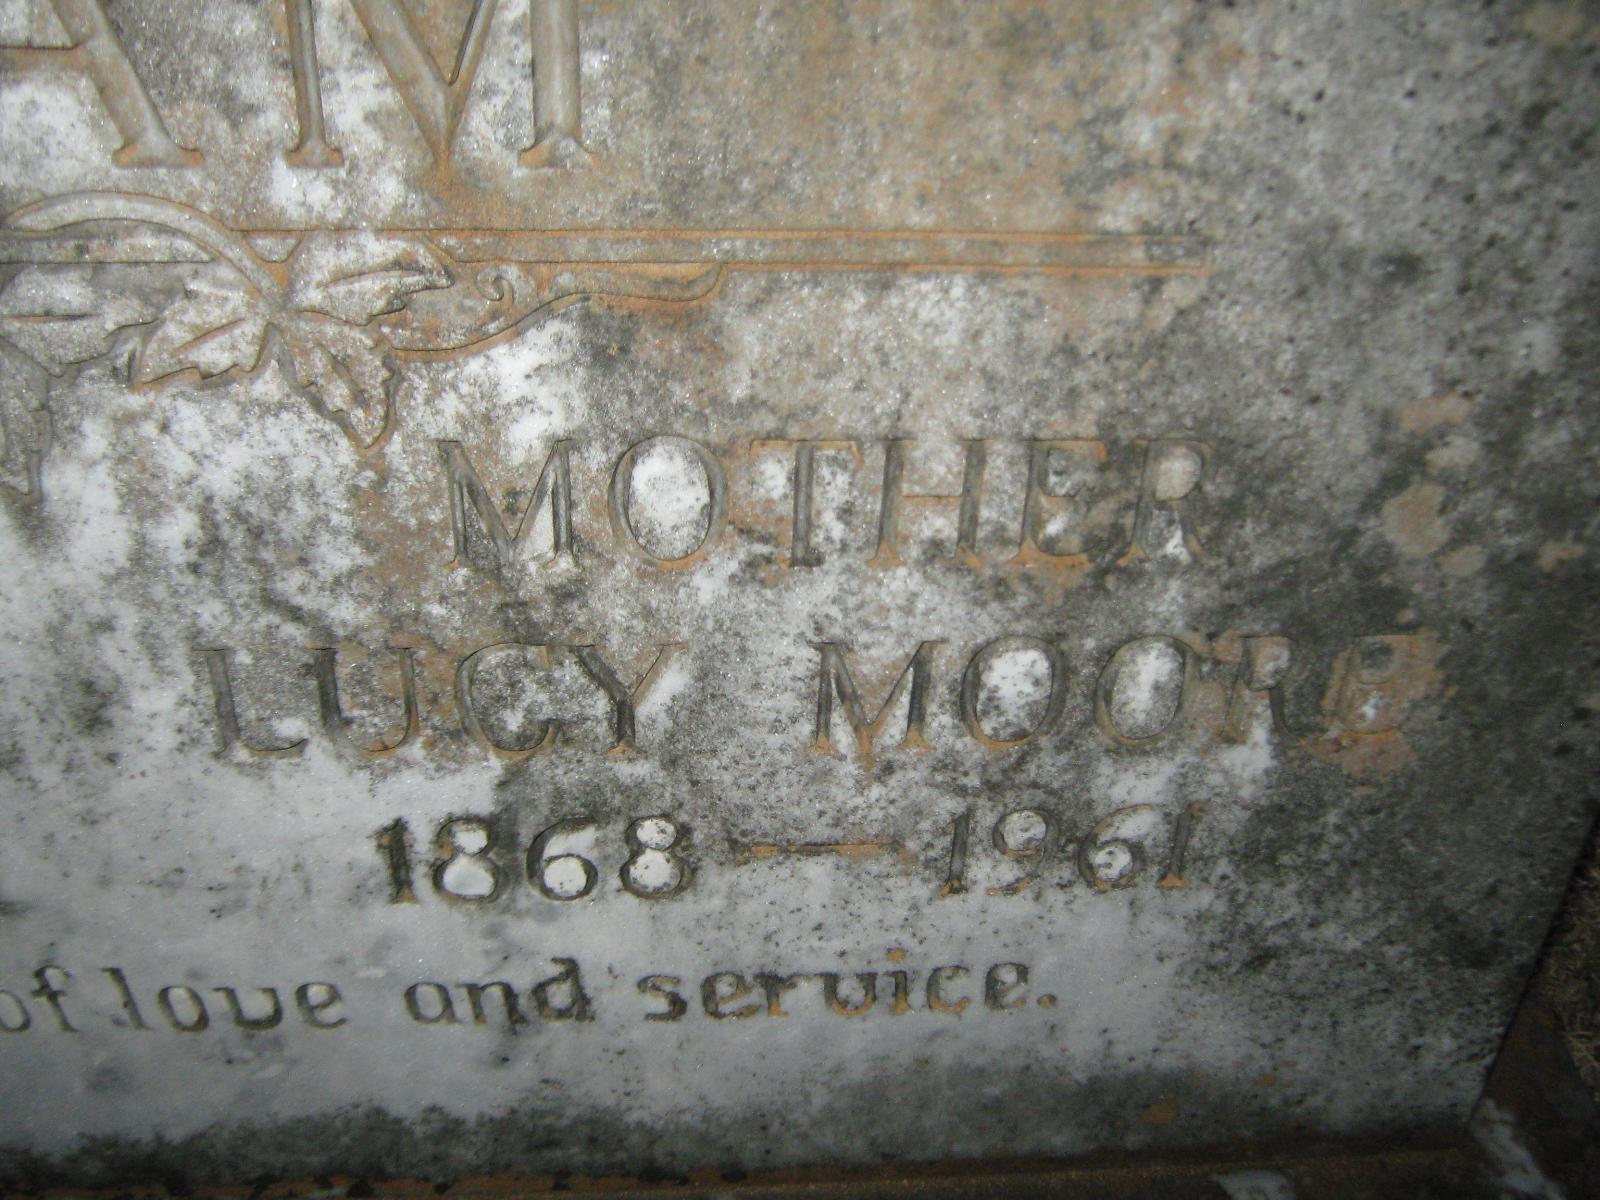 Lucy E Moore